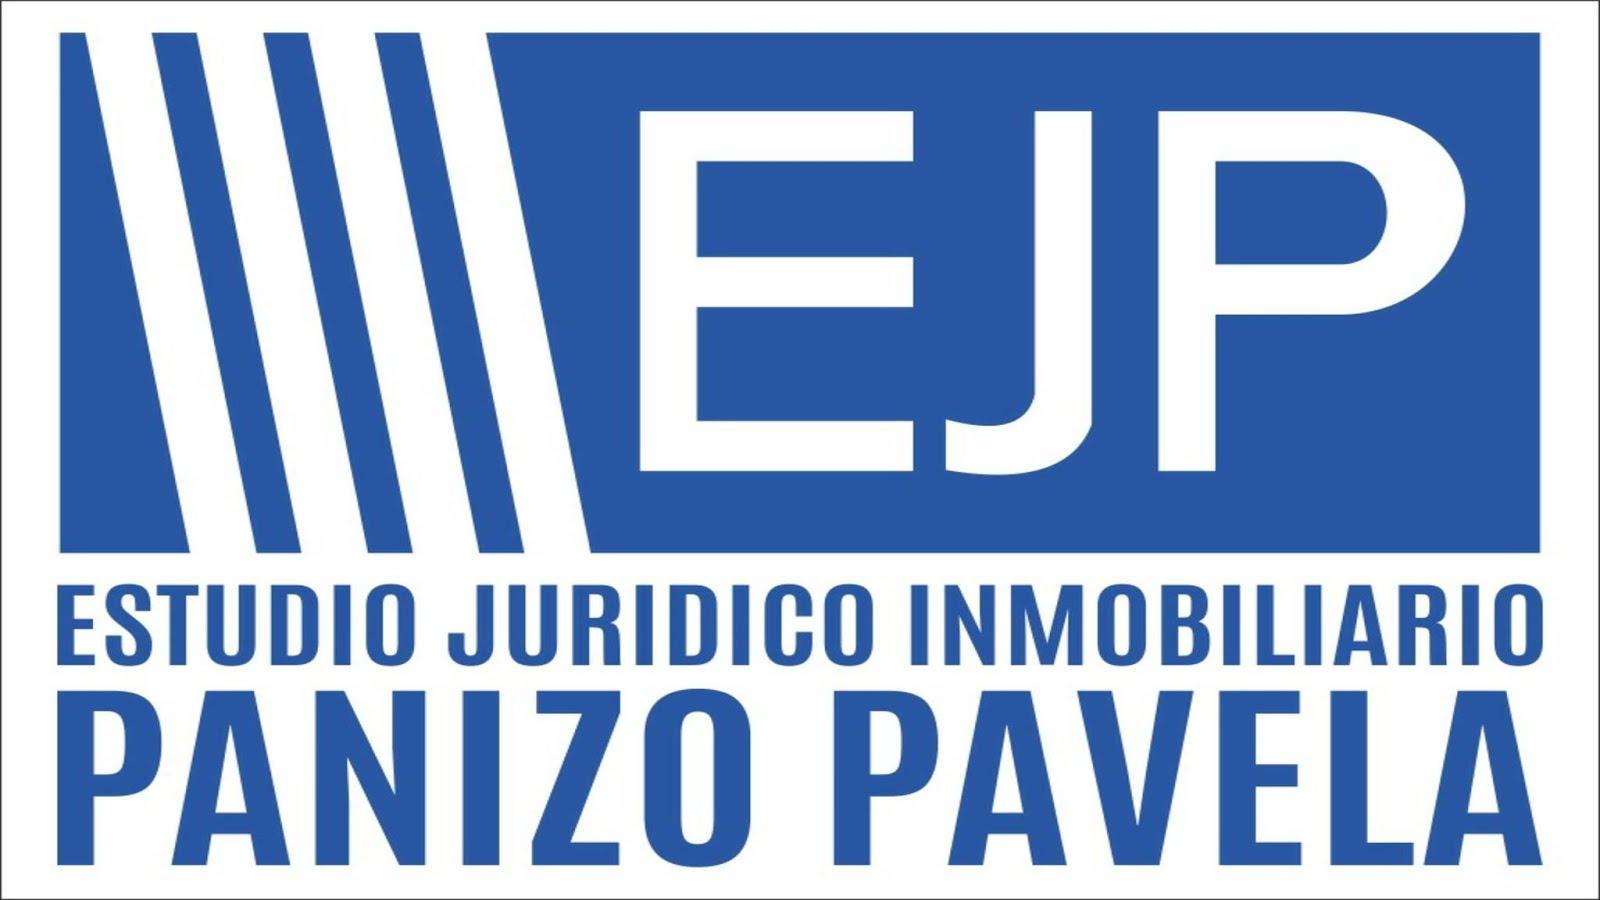 Abogados de FAMILIA en Mar del Plata :: EJP Panizo Pavela :: Divorcios, Convenios, Visitas